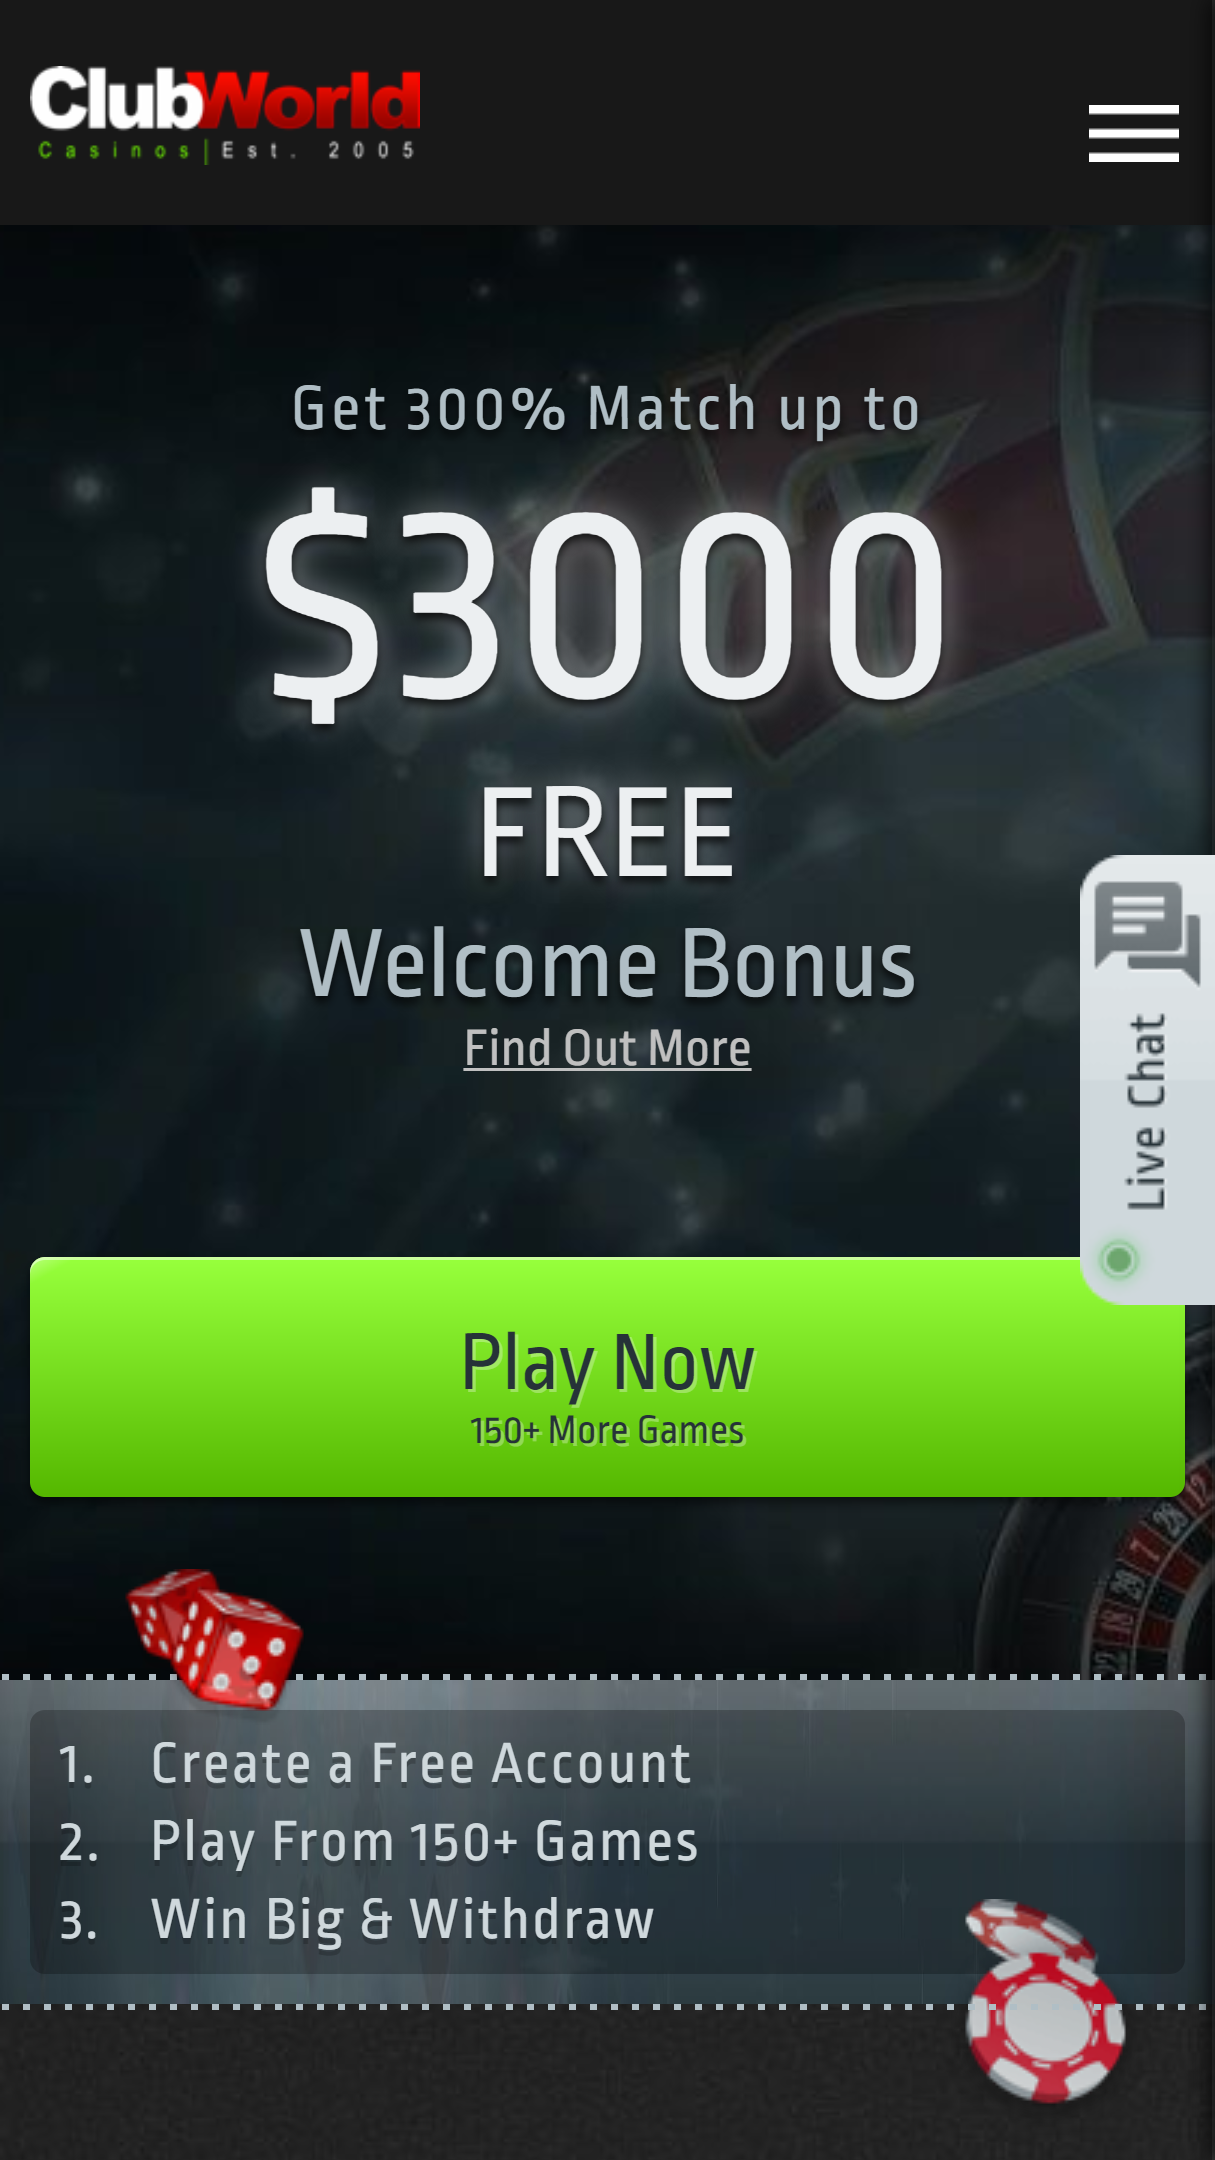 Club World Casinos App Homepage